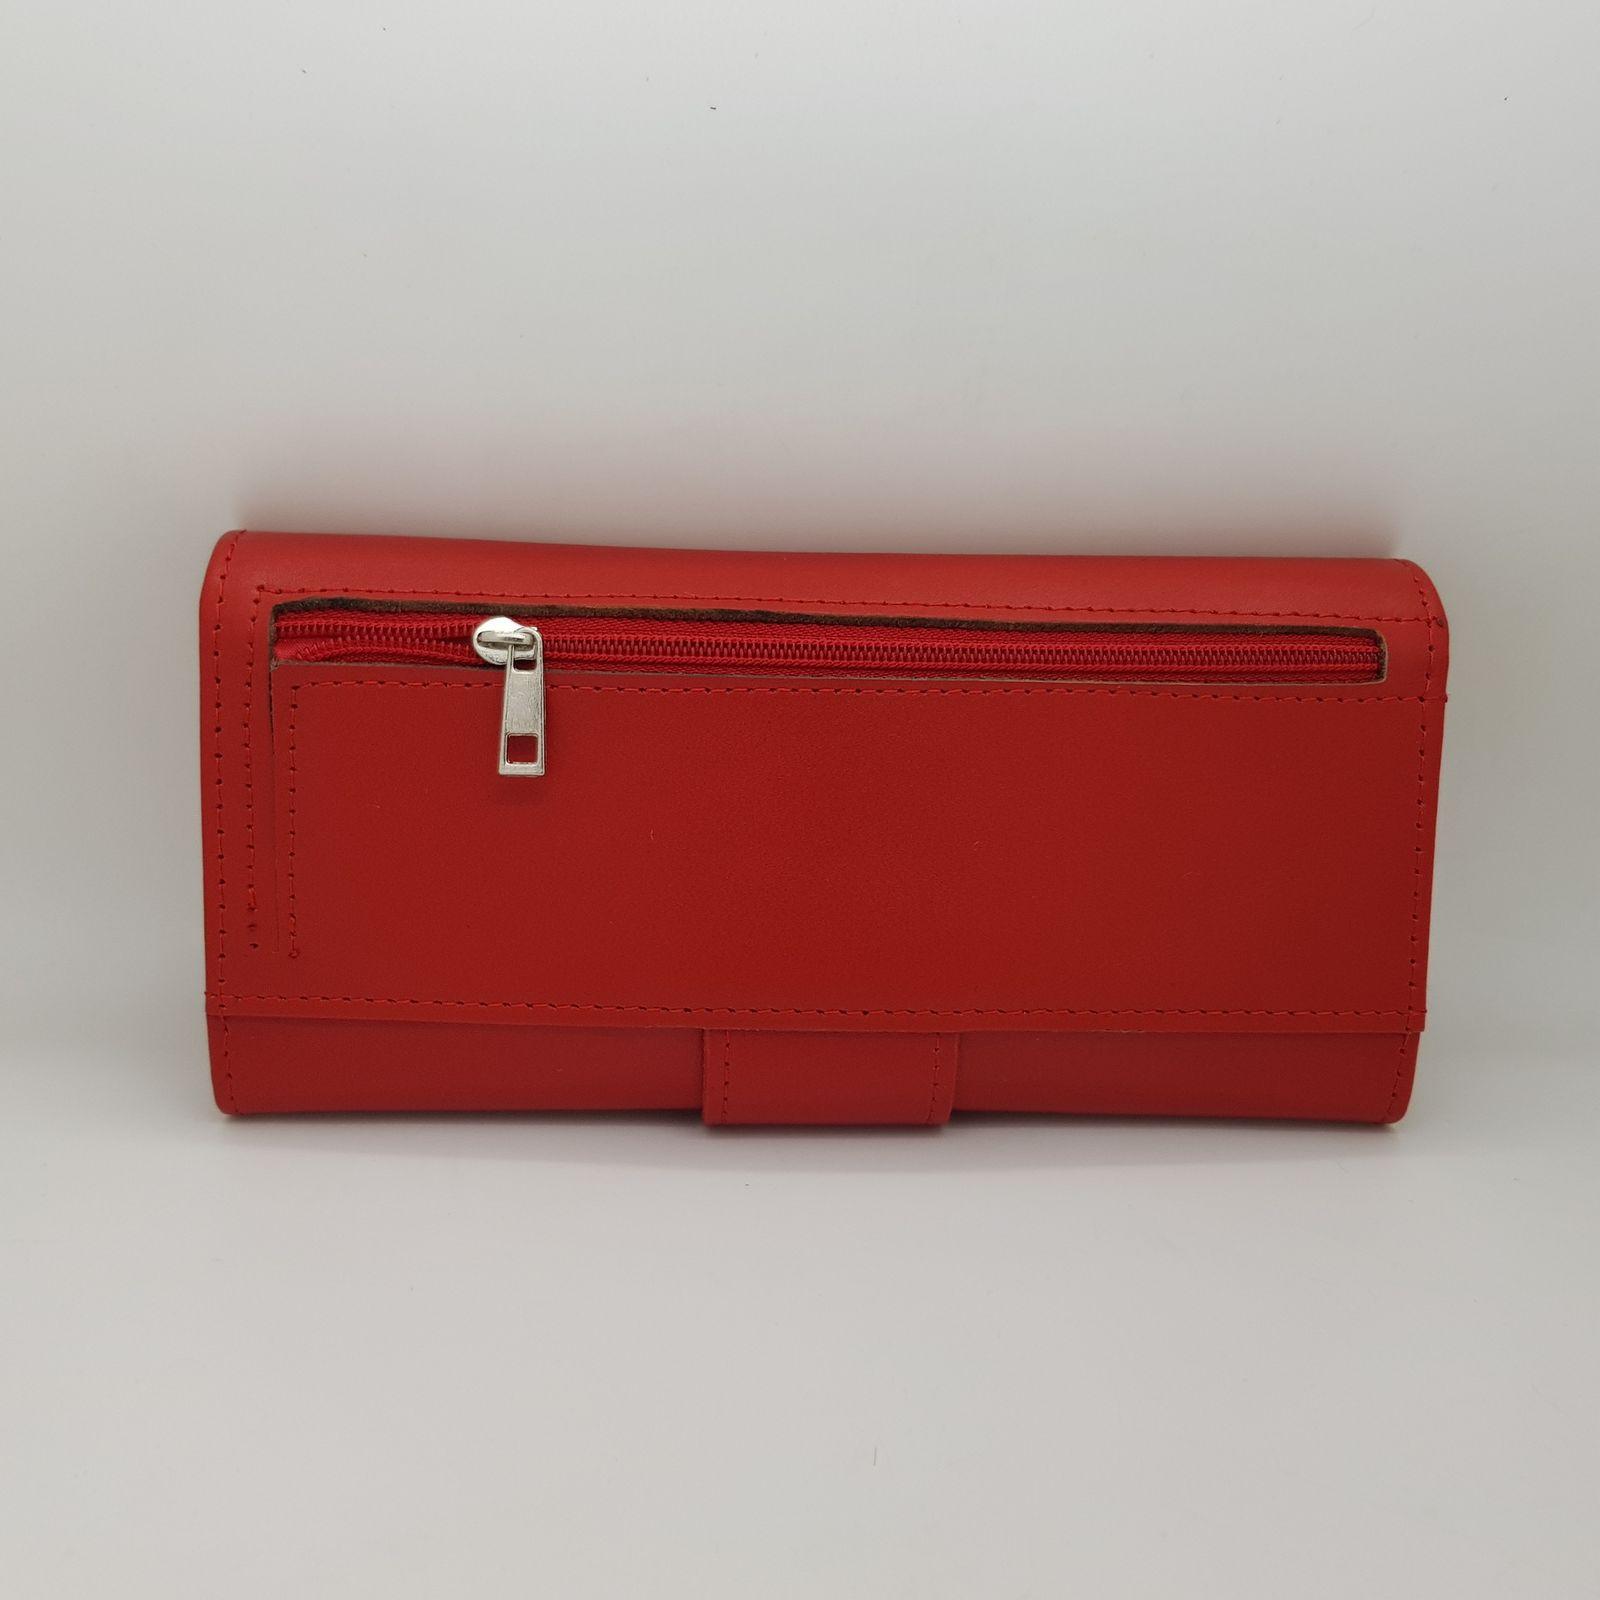 کیف پول زنانه چرم دیاکو مدل 315 -  - 15